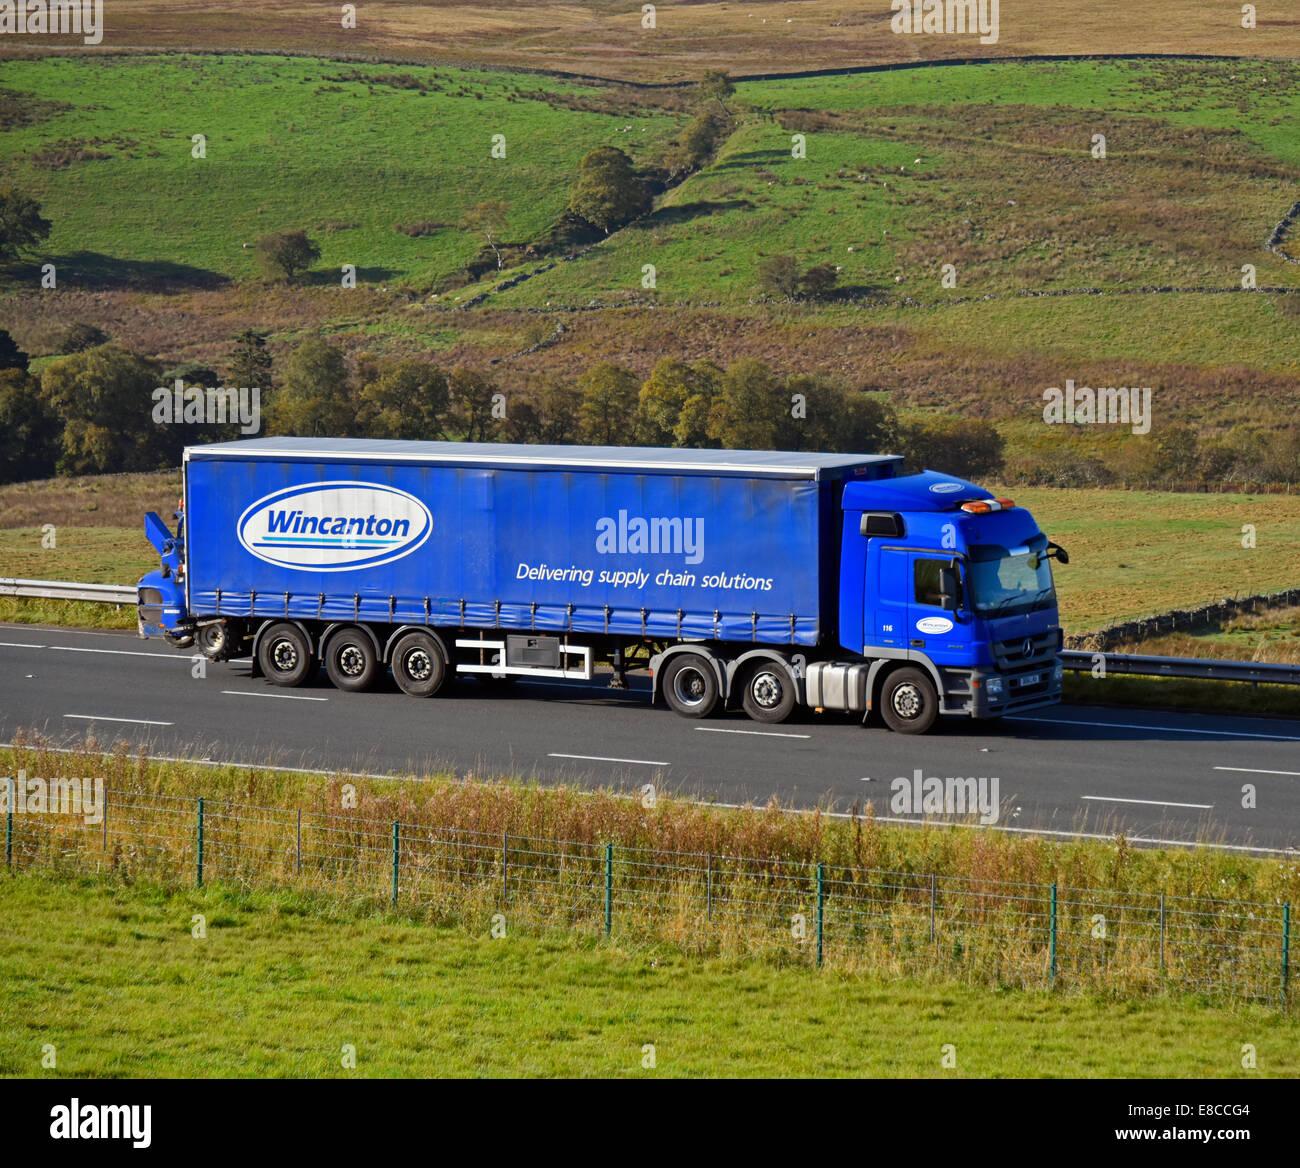 wincanton-hgv-m6-motorway-northbound-shap-cumbria-england-united-kingdom-E8CCG4.jpg